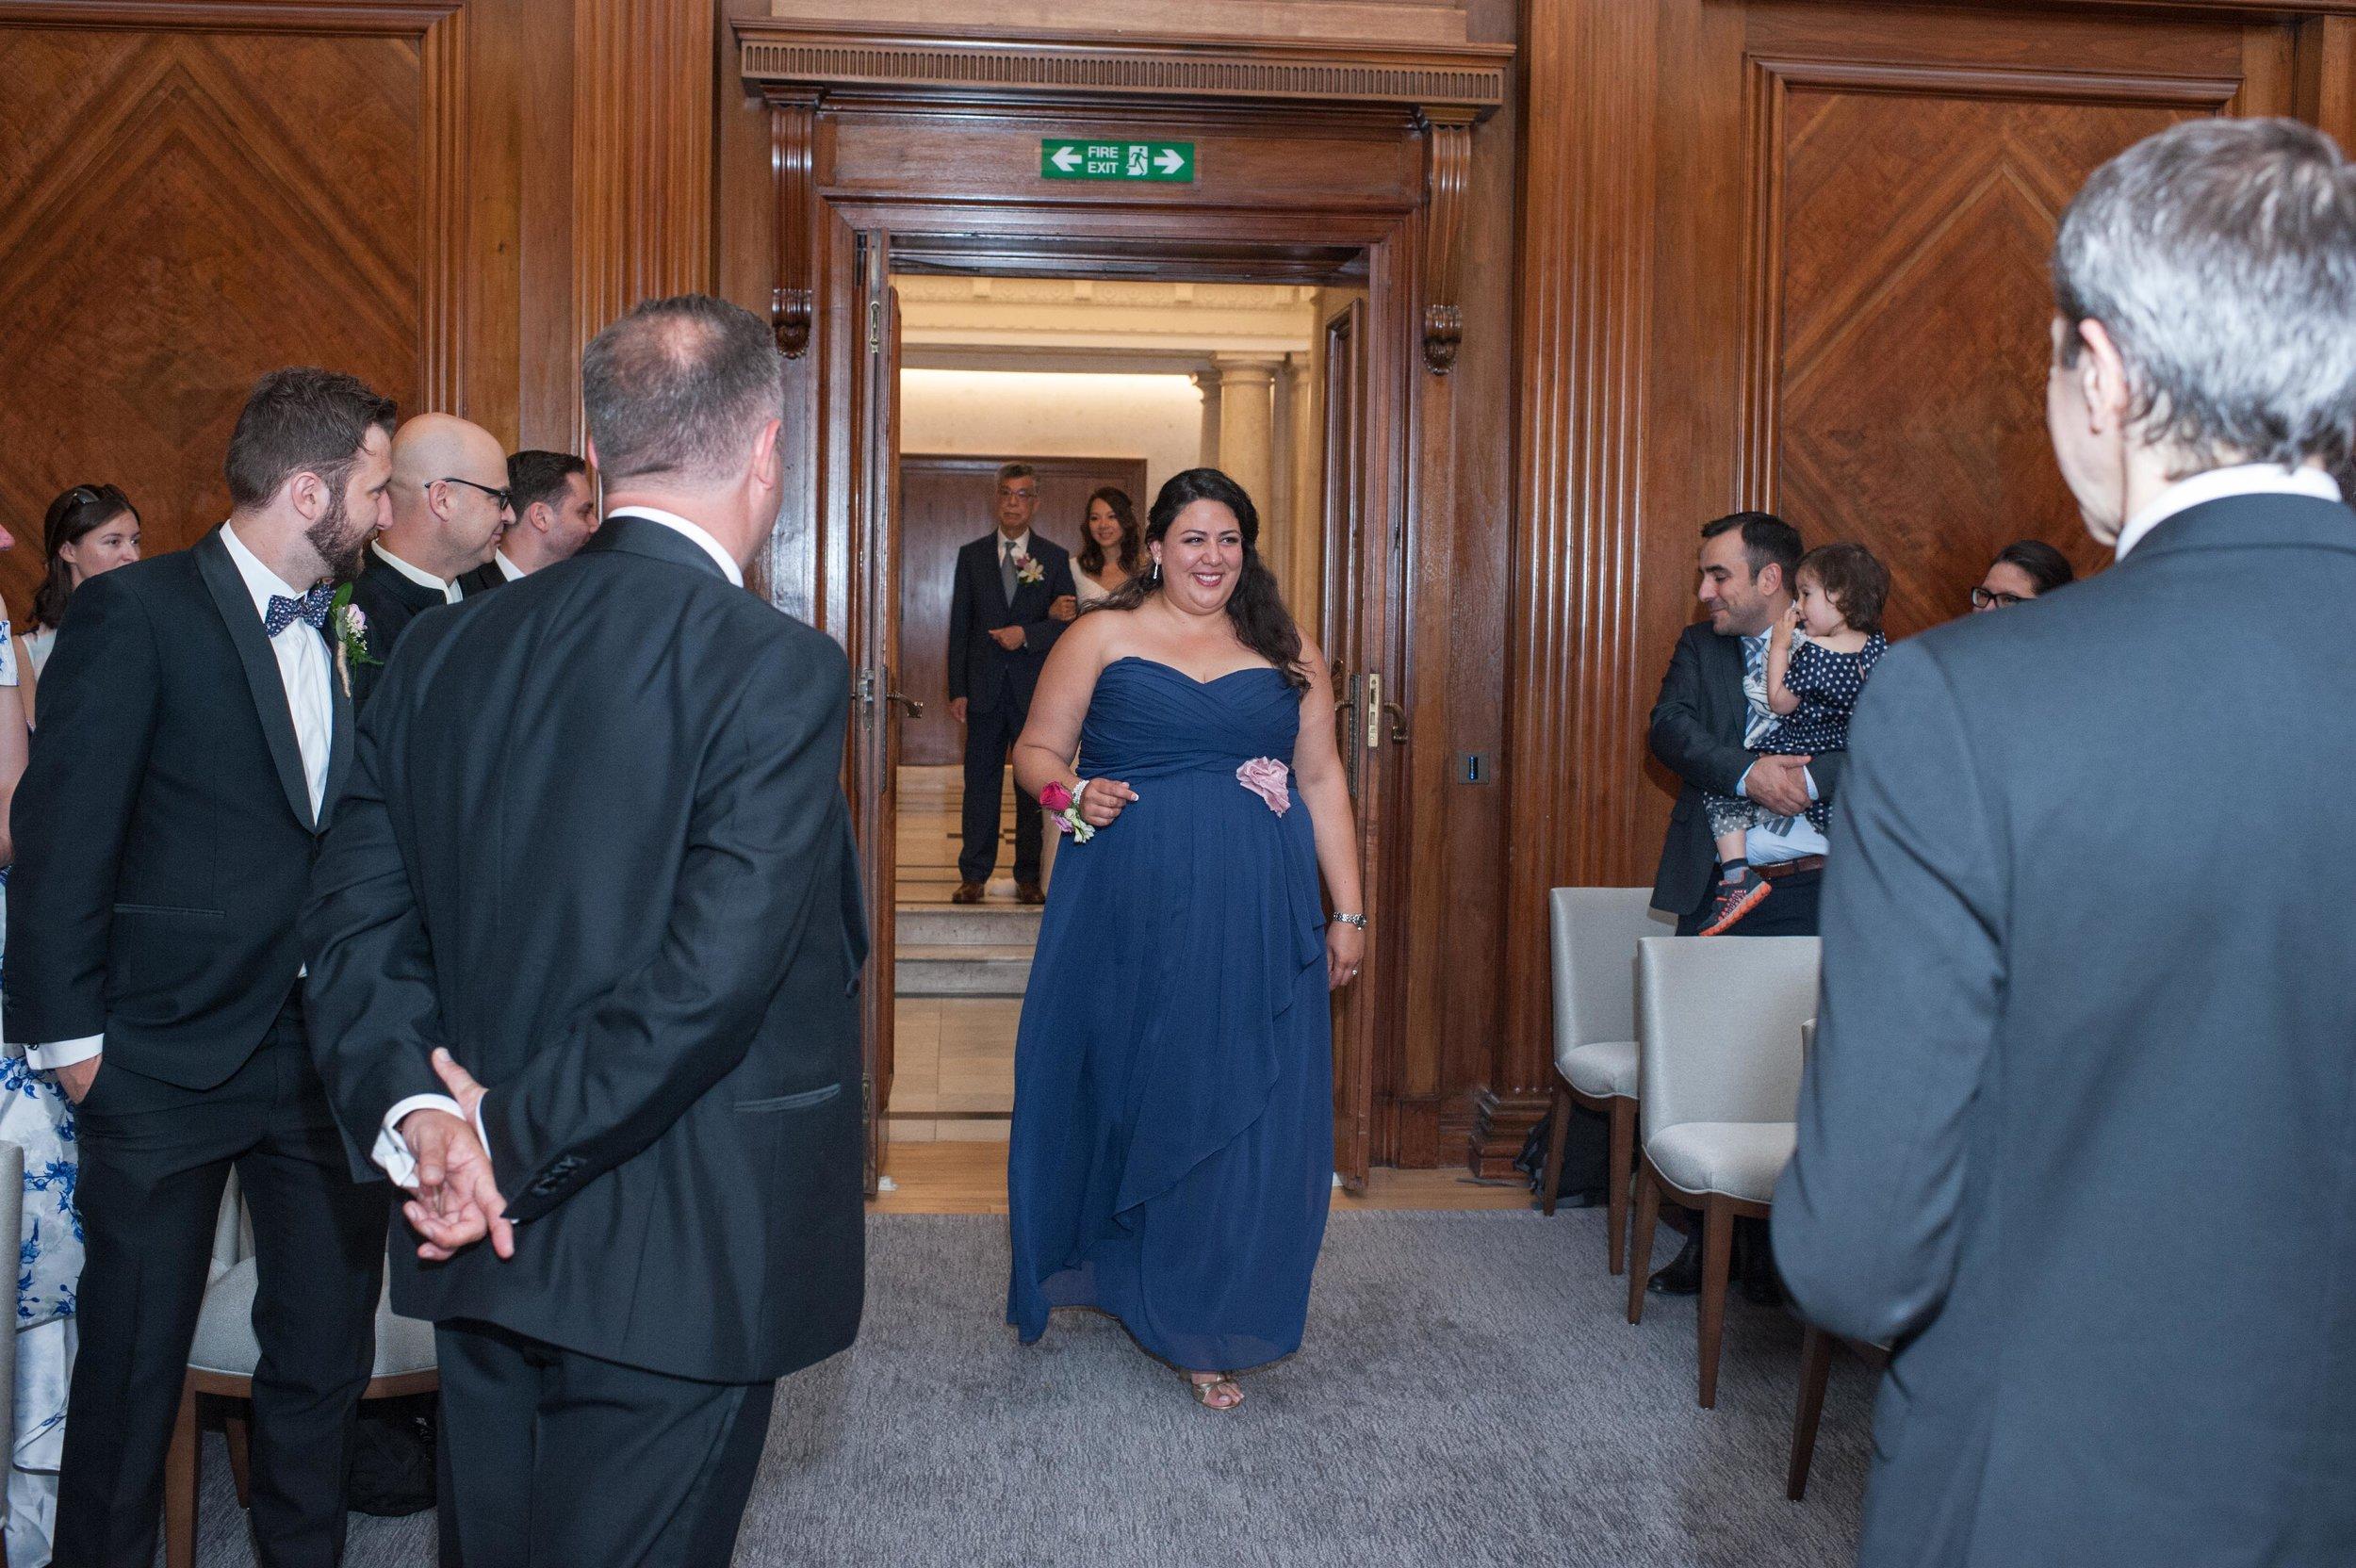 D&M_Marylebone Town Hall Wedding (87 of 239).jpg